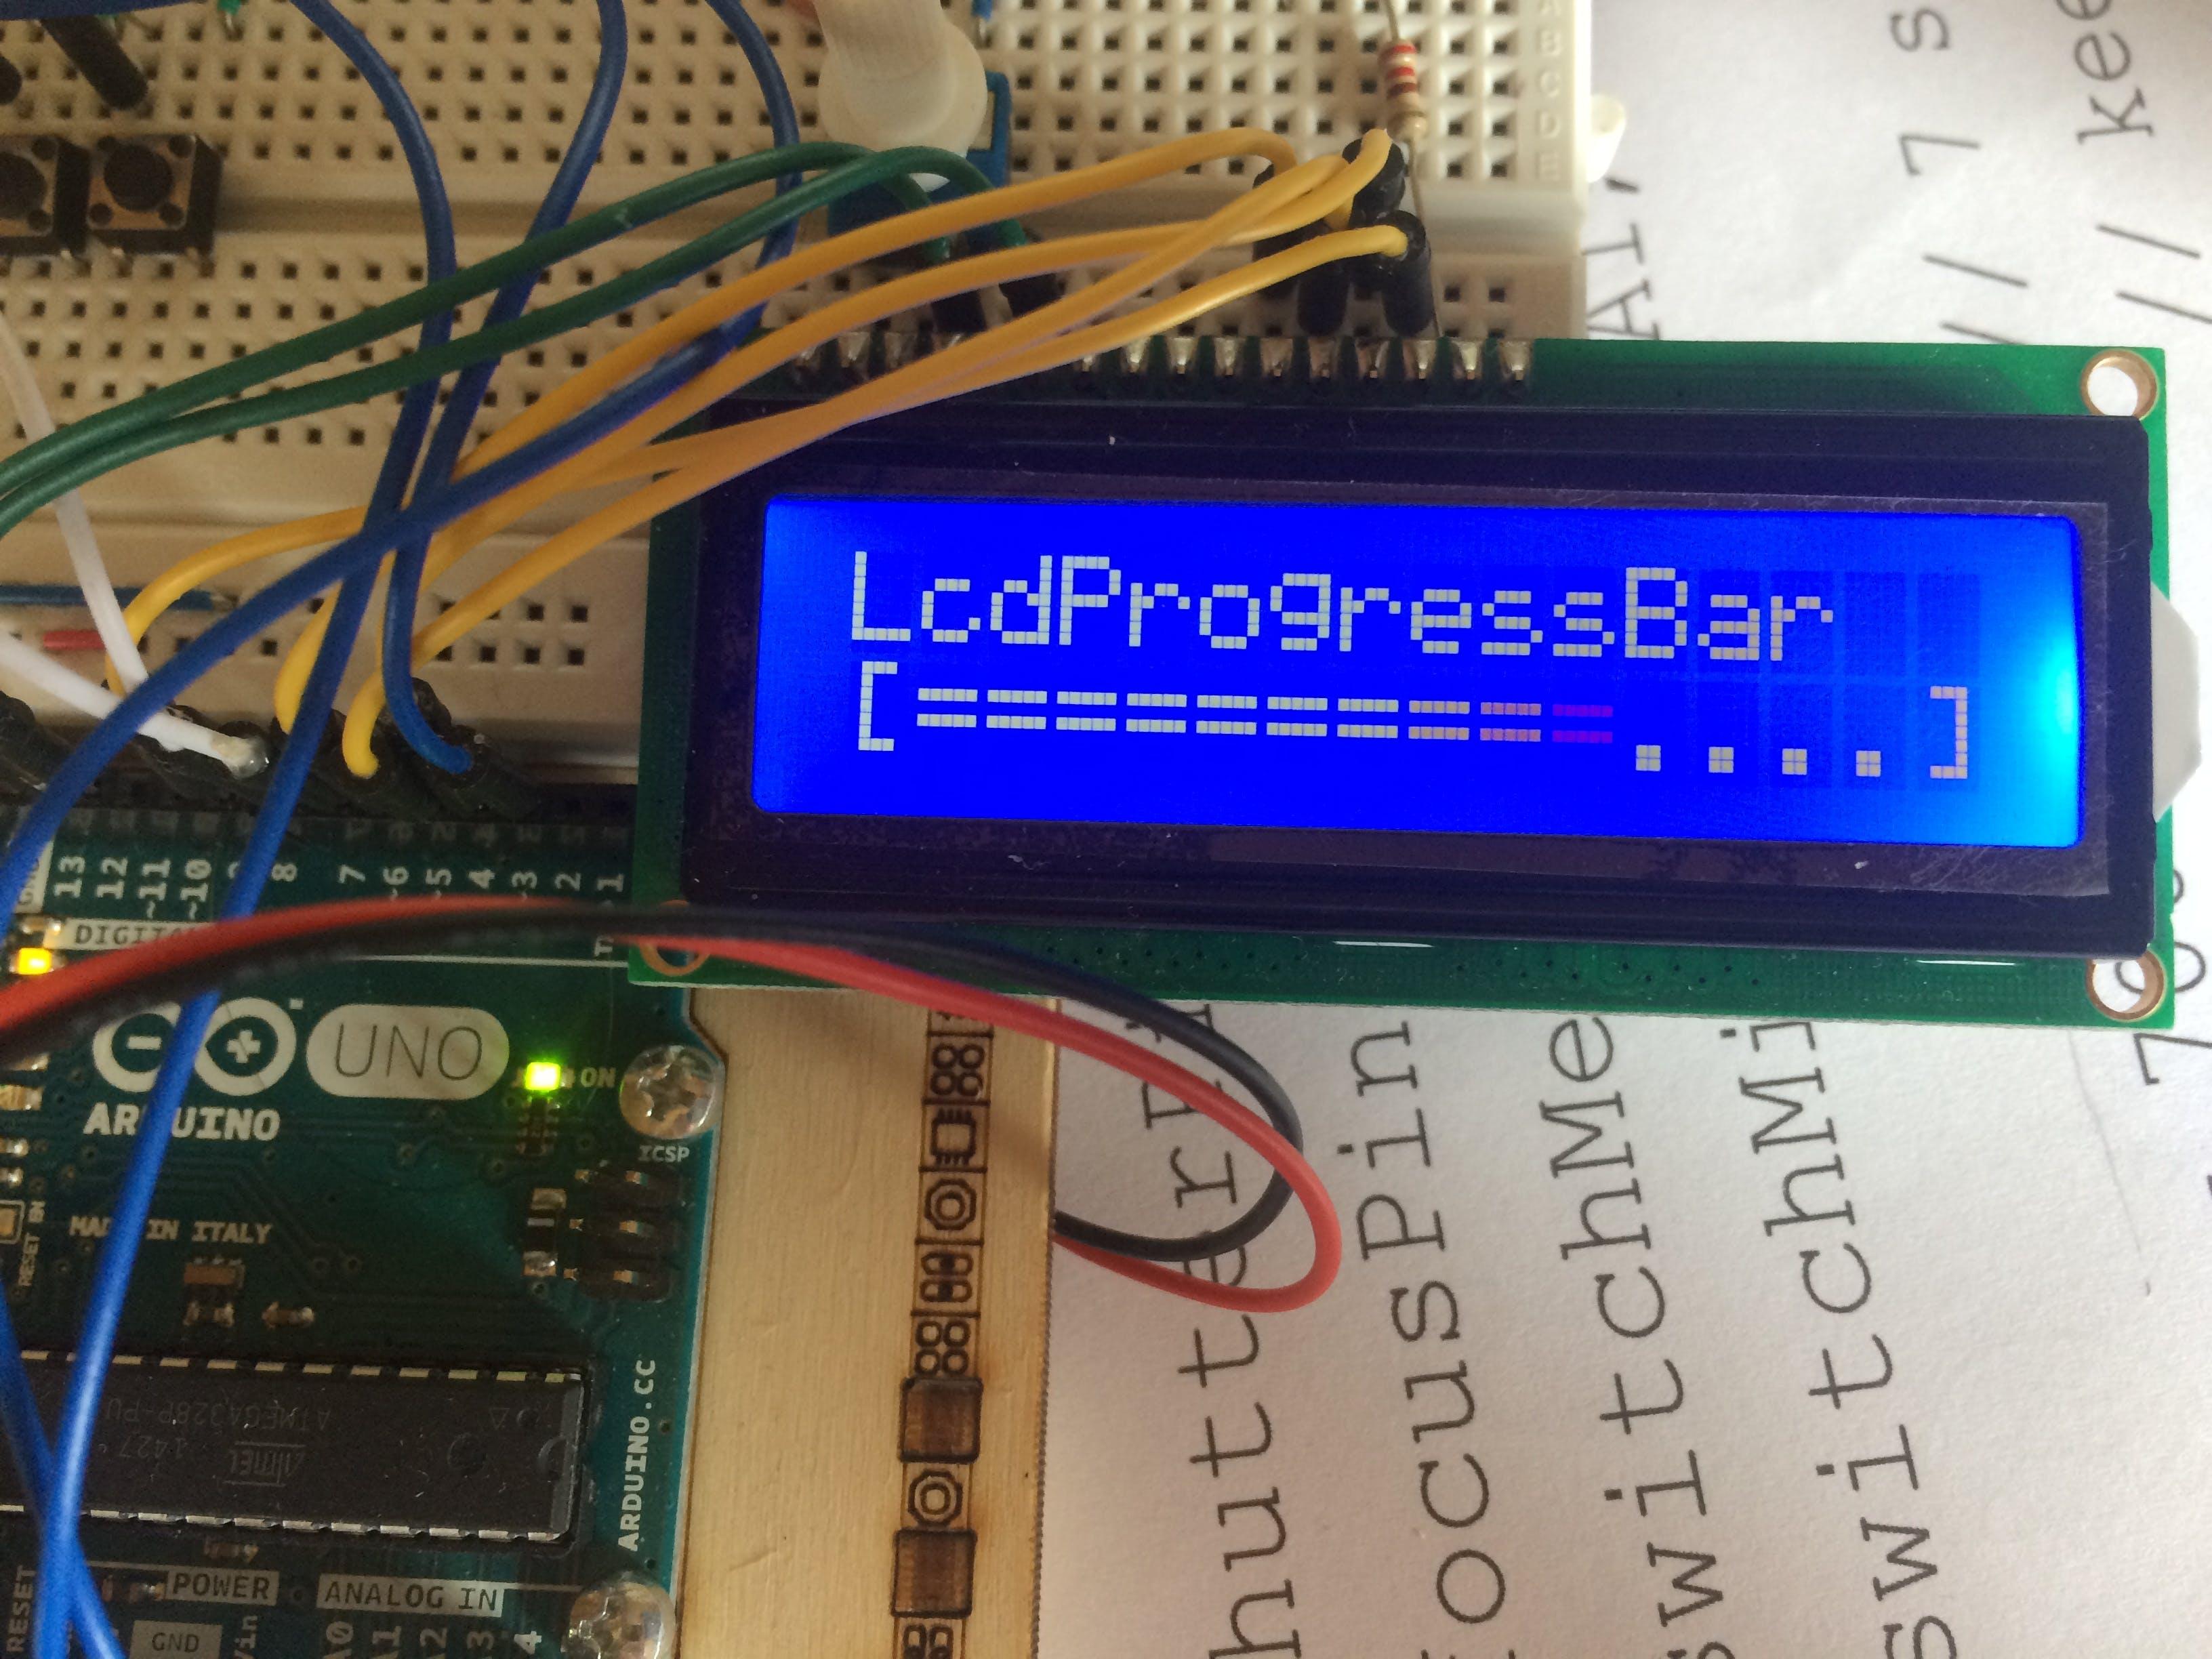 LcdProgressBar